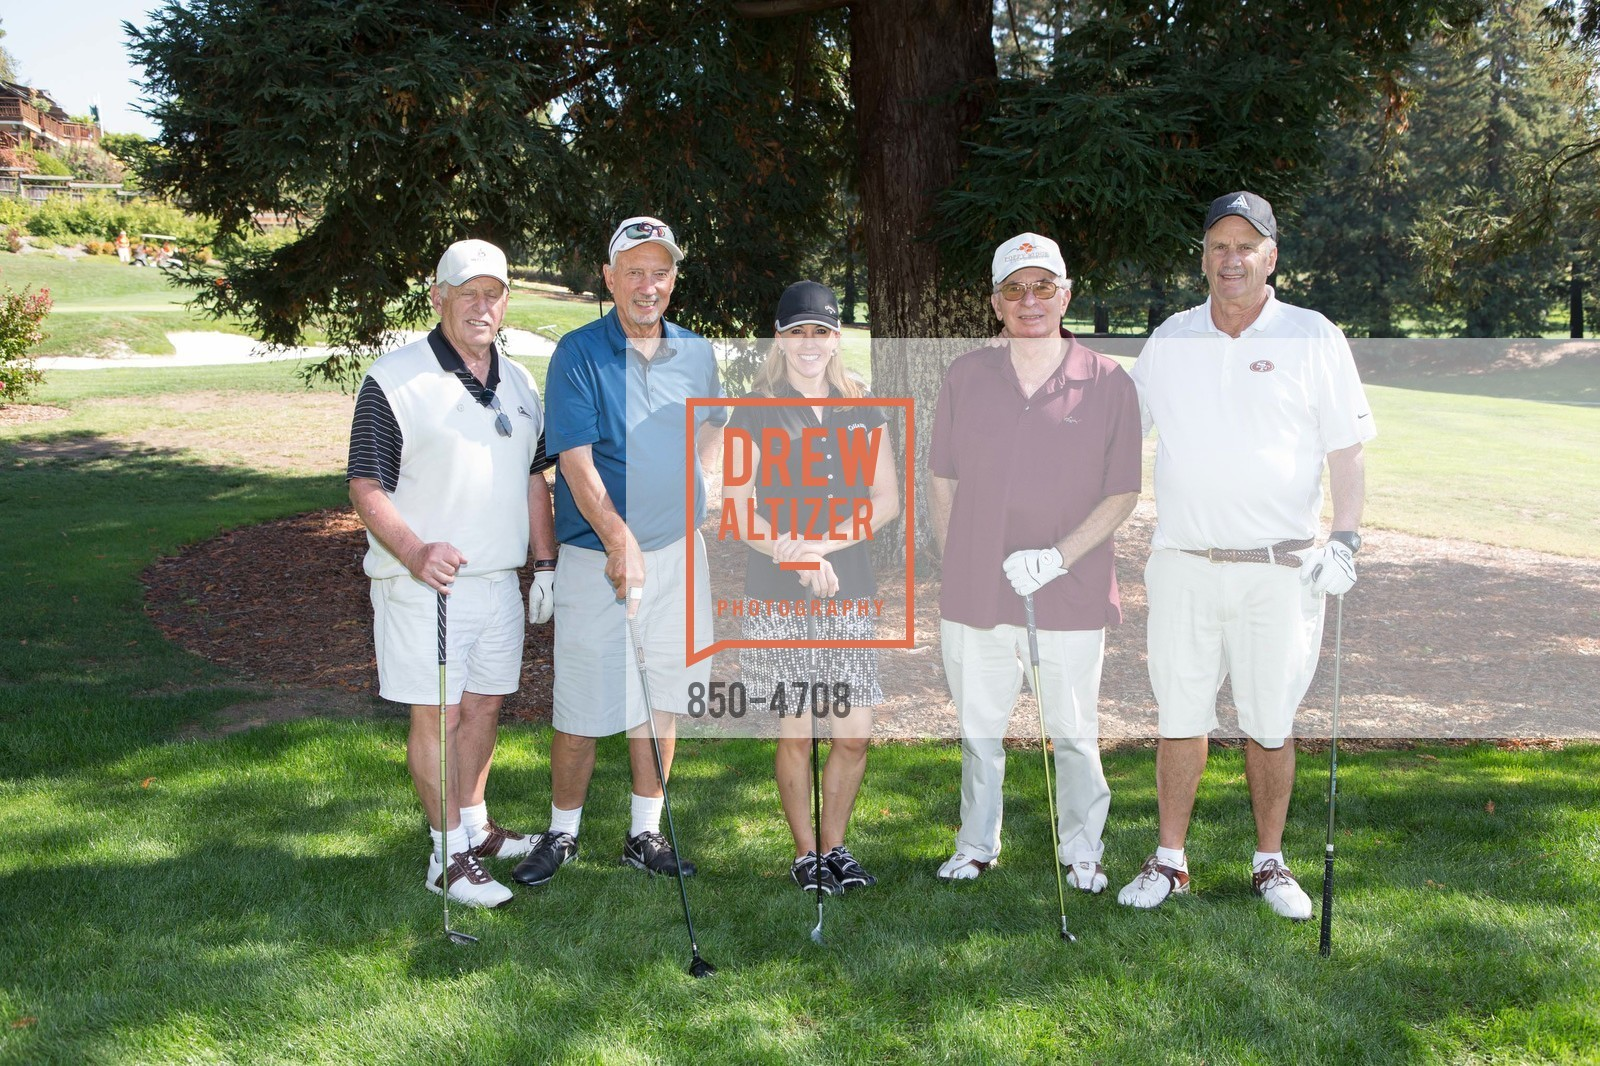 Joe Crosetti, Andy Cresci, Tina Michelson, Rich Clarke, Mario Cresci, Photo #850-4708